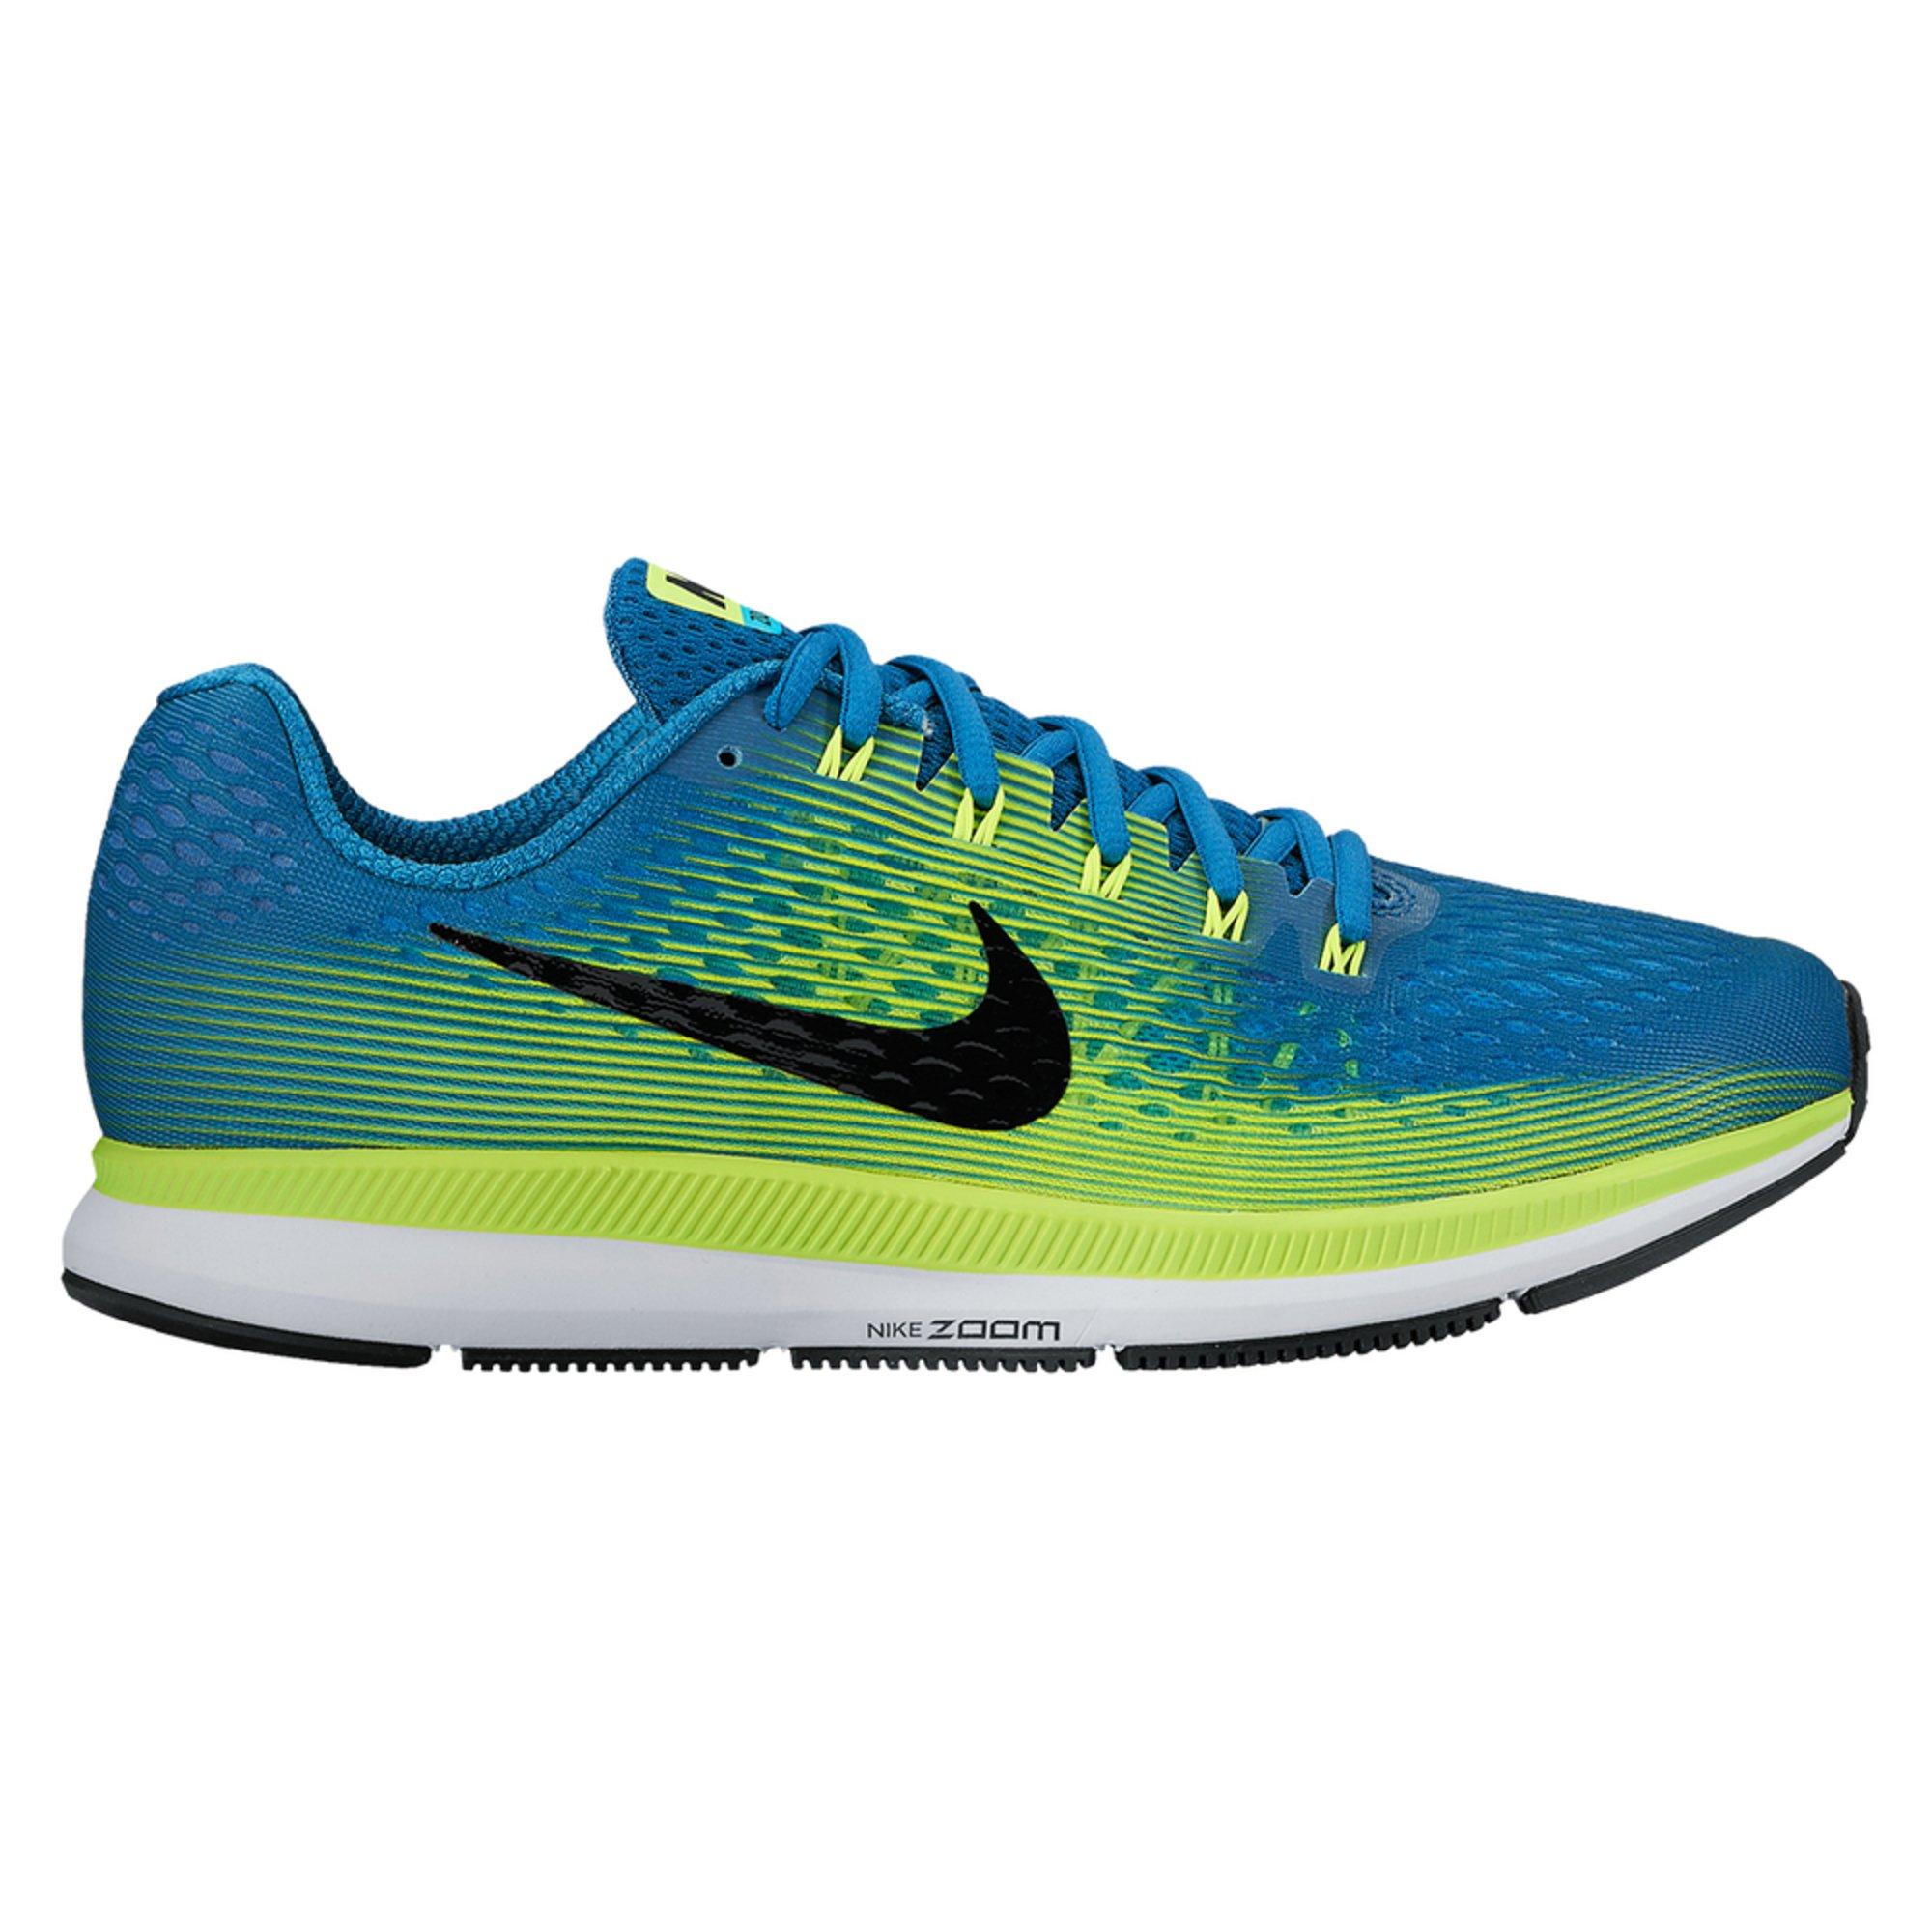 Nike Air Zoom Pegasus 34 Men's Running Shoe Industrial Blue/ Black/ Volt/  Chlorine Blue   Shoes - Shop Your Navy Exchange - Official Site